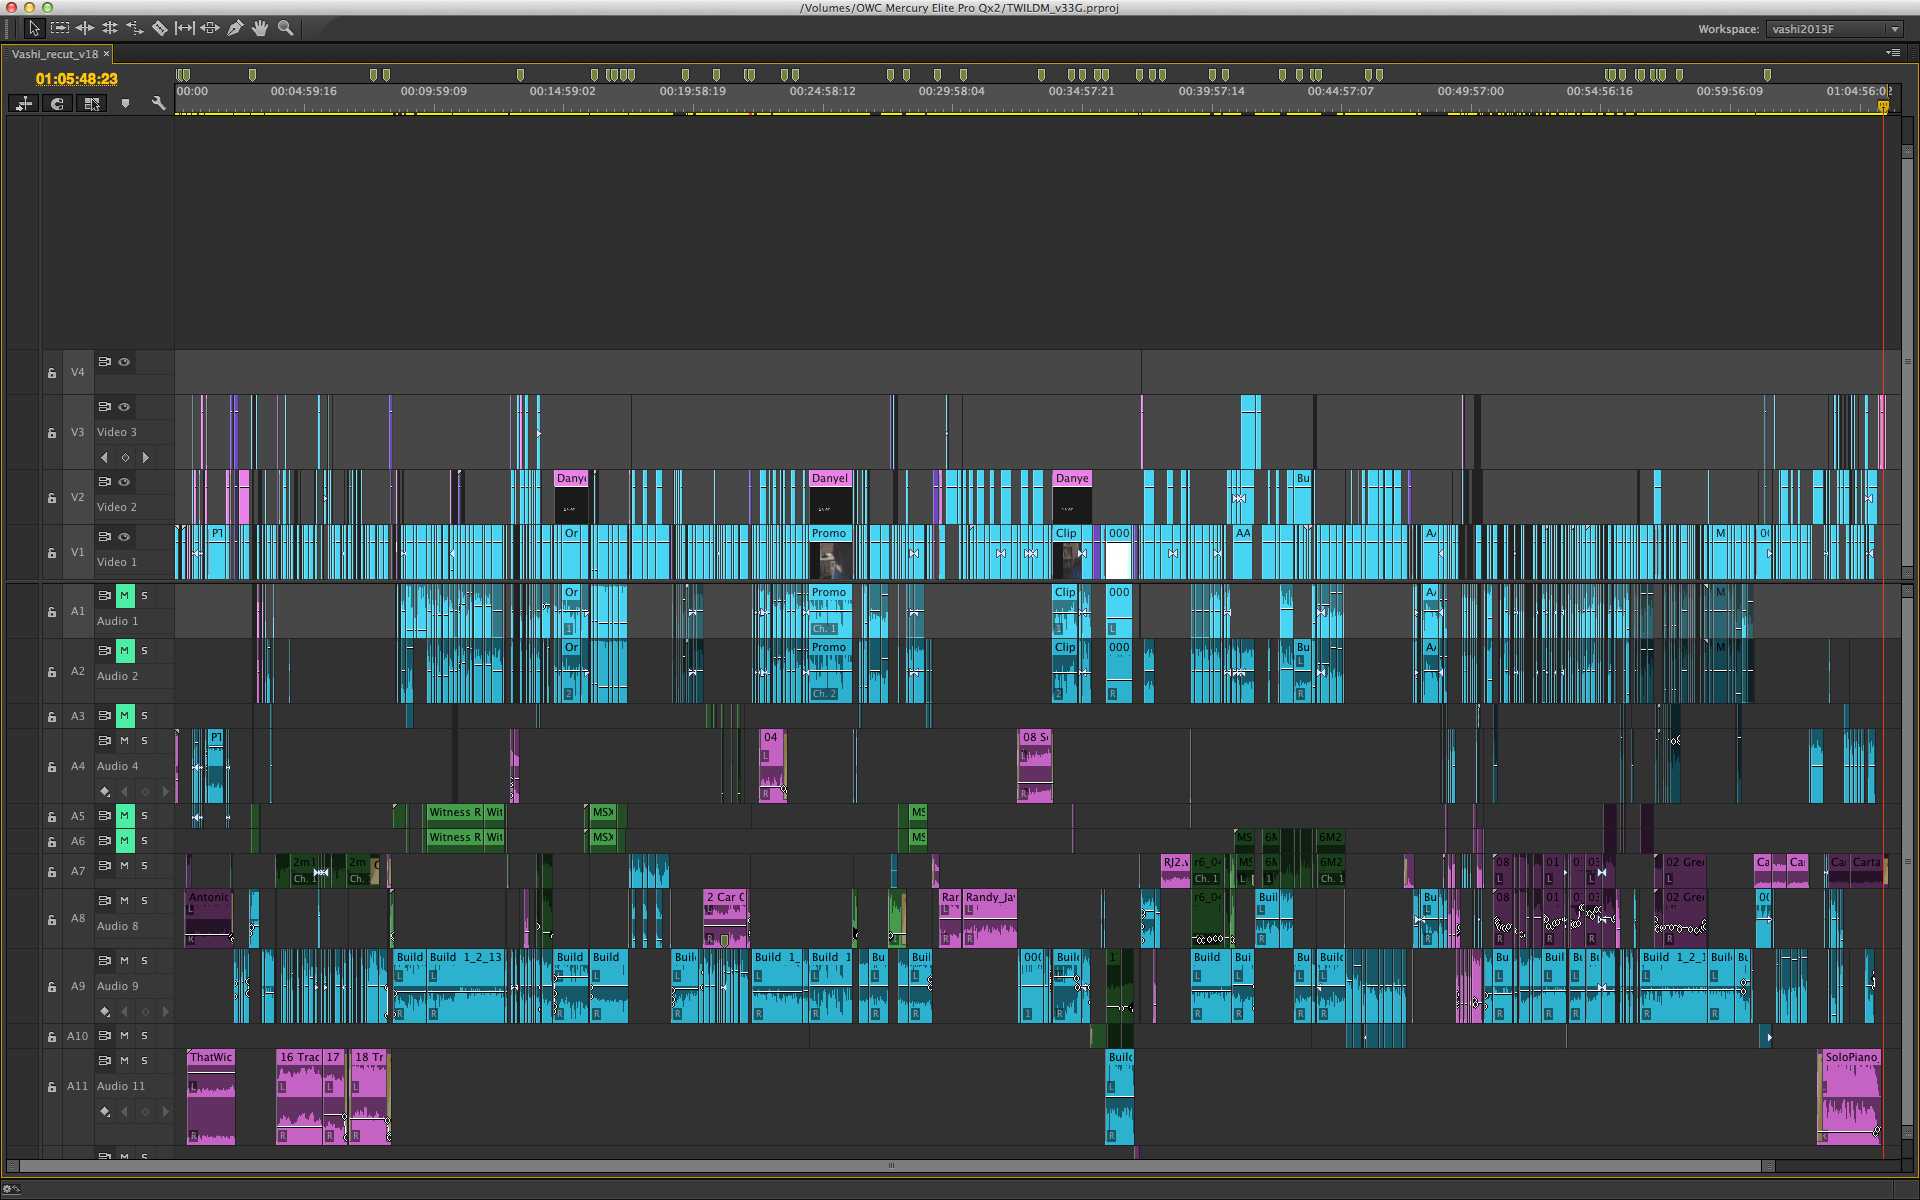 Vashi Nedomansky edits documentary on PTSD with Adobe Premiere Pro CC 12